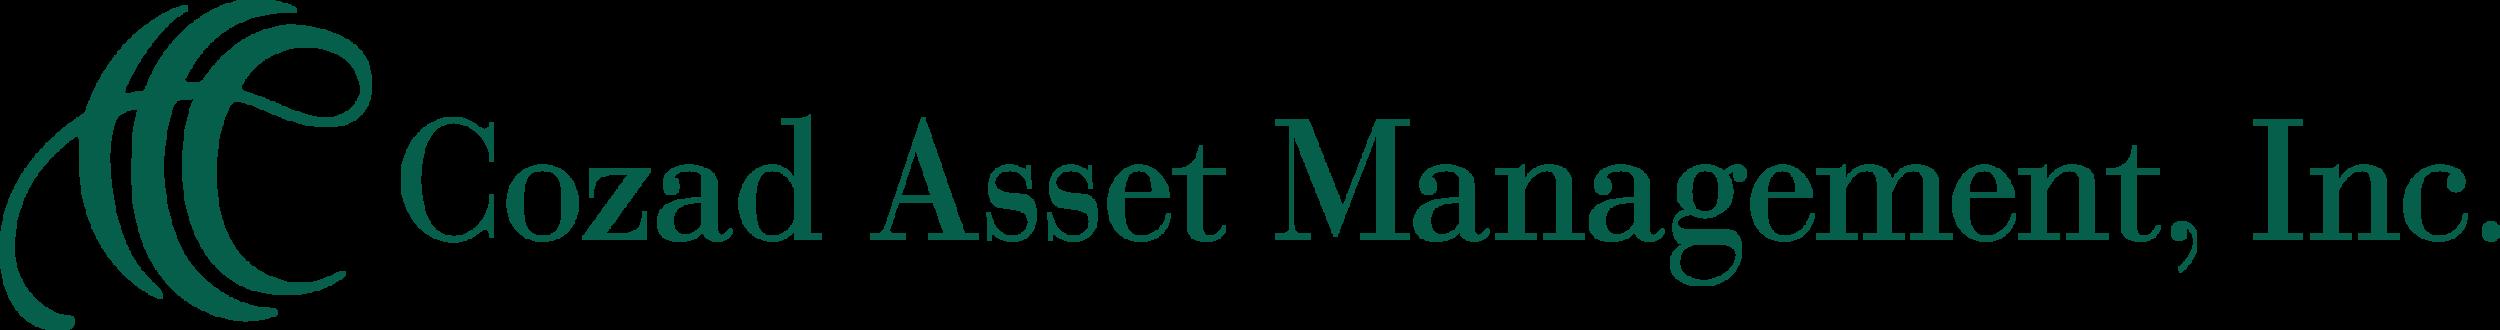 Cozad Asset Management Logo_2018x.png